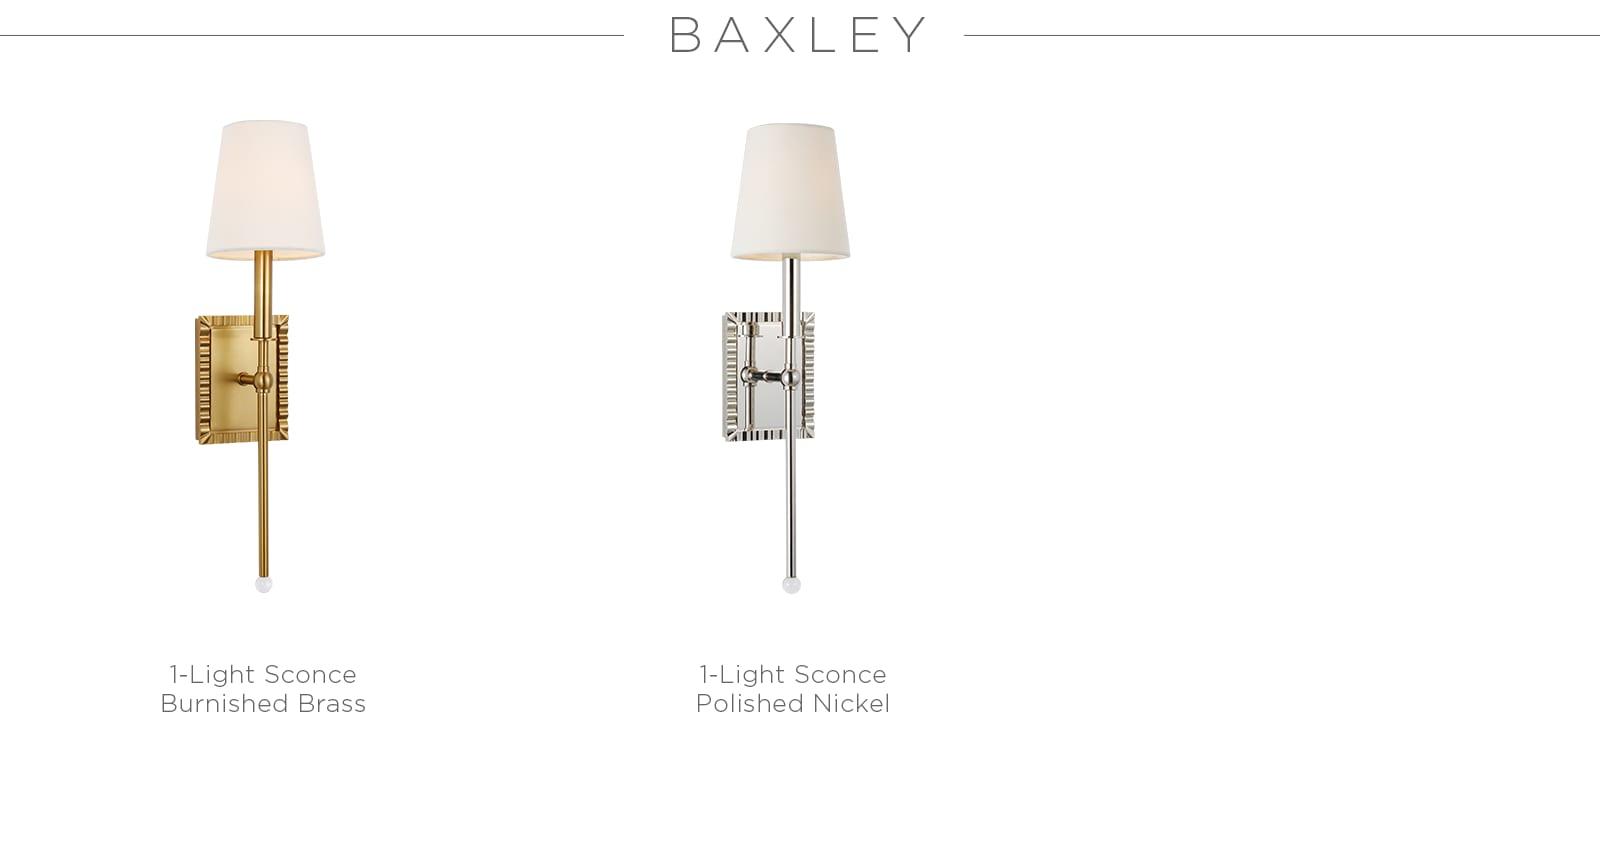 Baxley Series